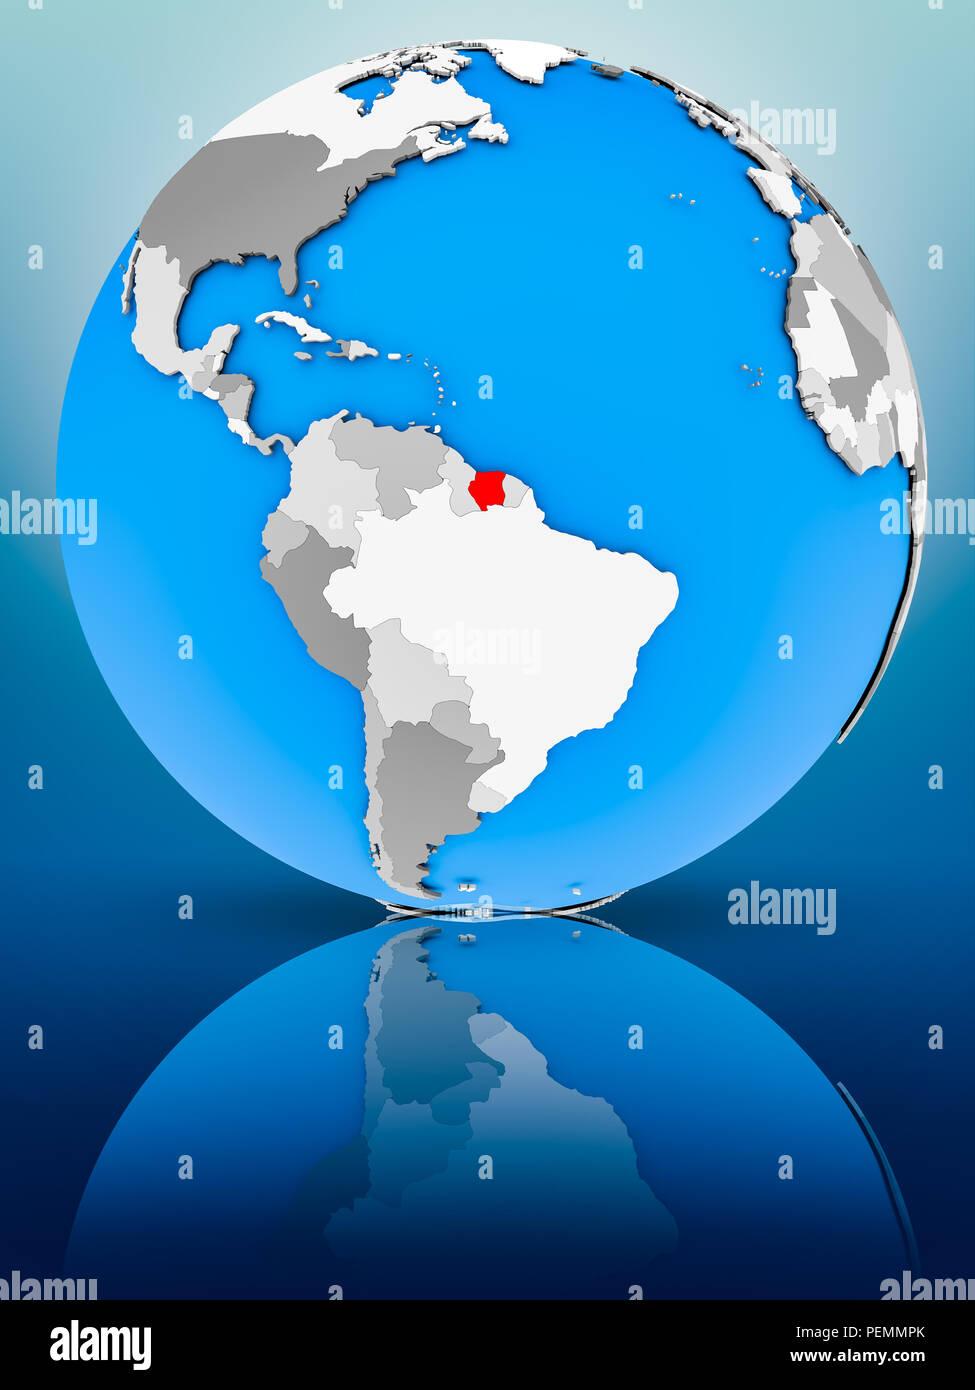 Suriname on globe reflecting on surface. 3D illustration. - Stock Image